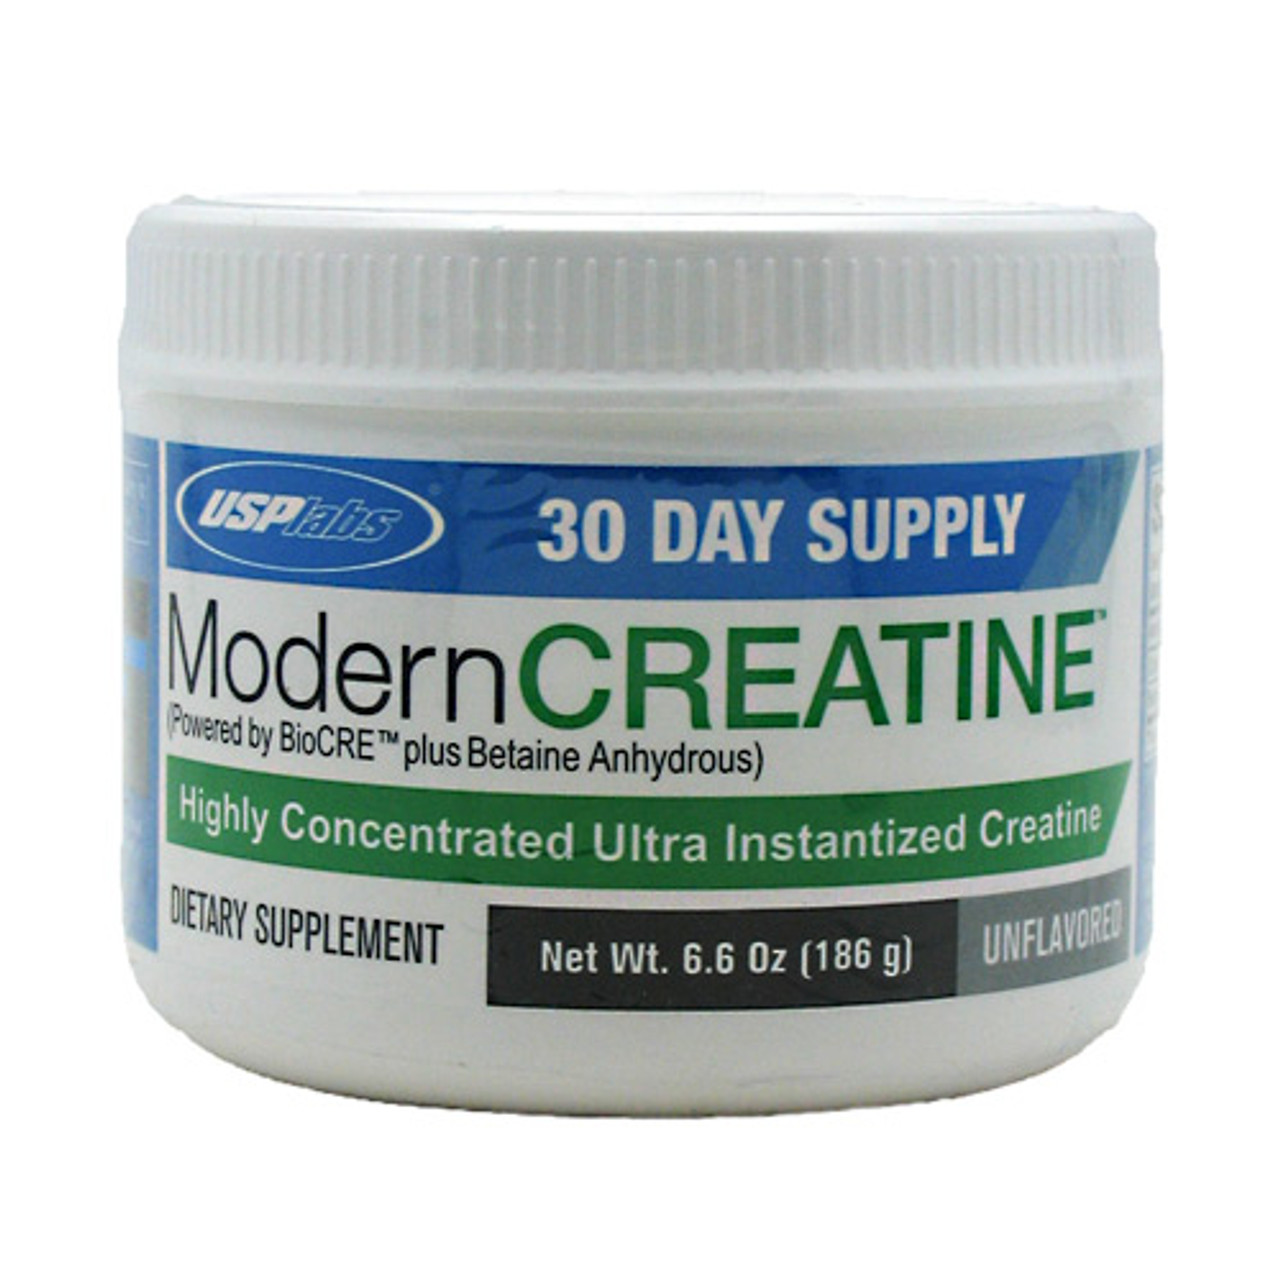 Modern Creatine 30/srv USP Labs